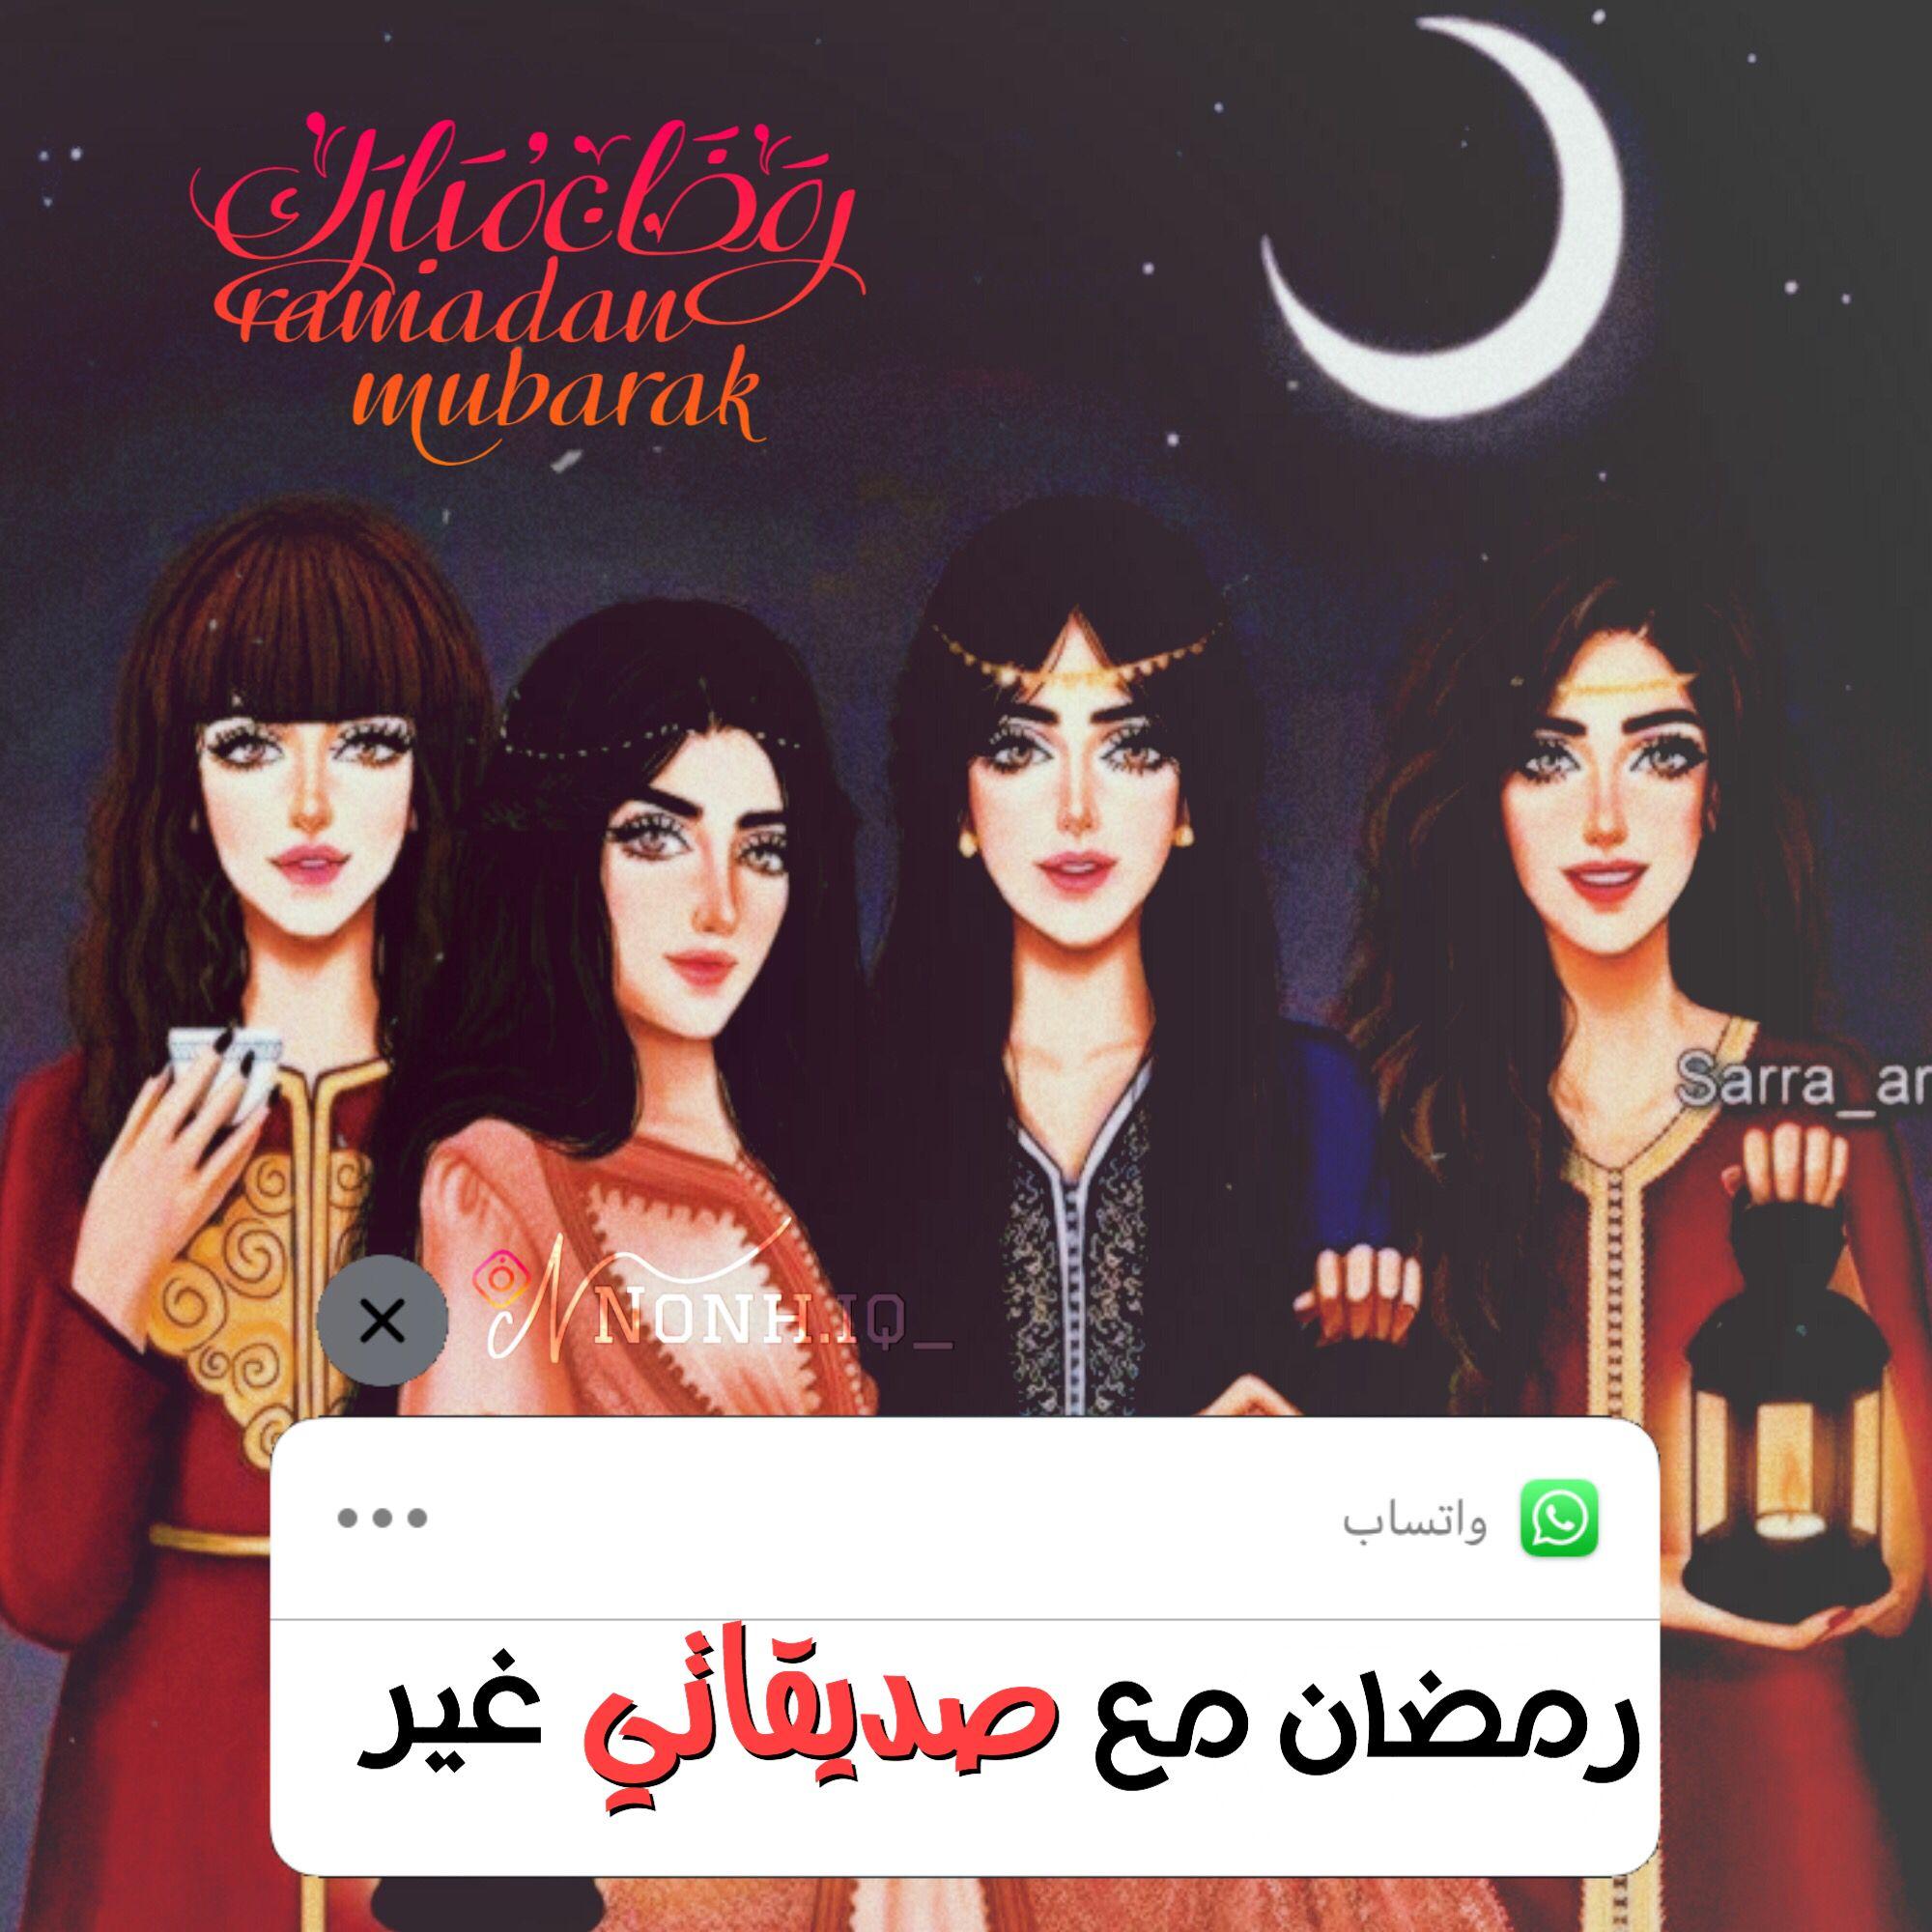 رمزيات بنات تصاميم صور بنات رمضانيات Girly Pictures Ramadan Cards Ramadan Kareem